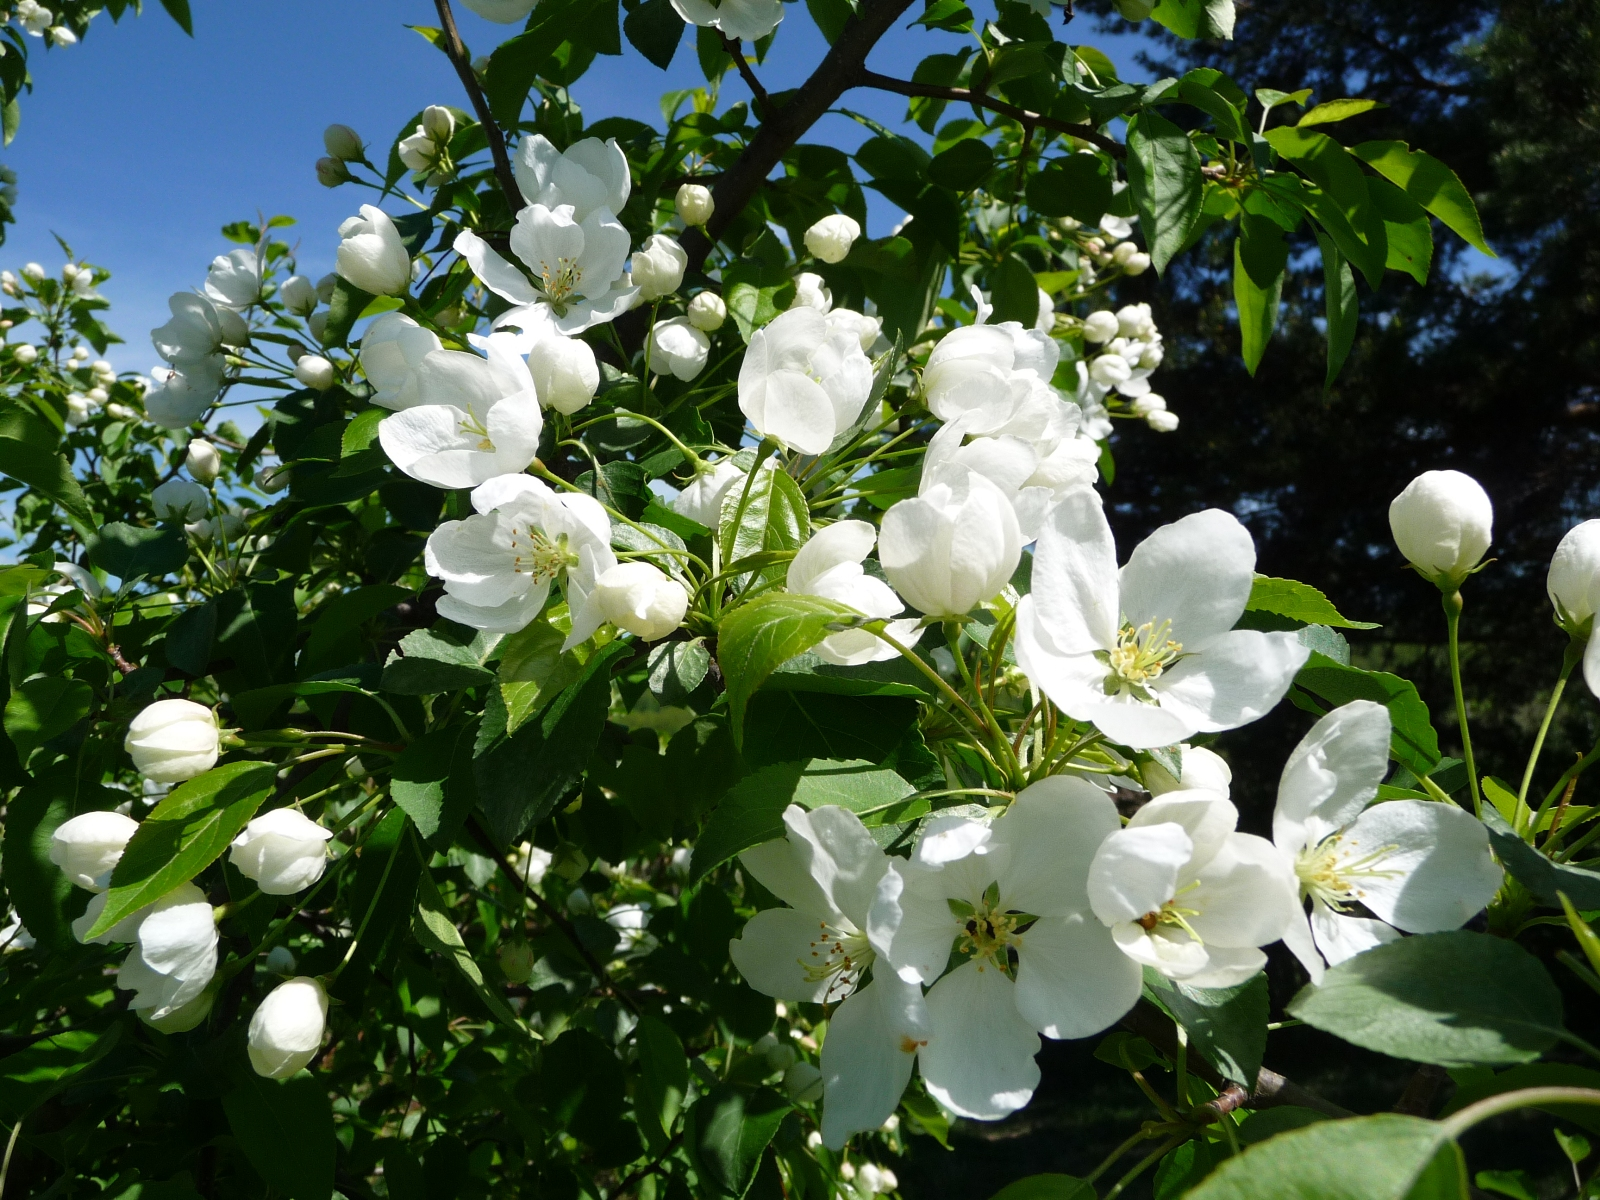 Яблоня в цвету фото